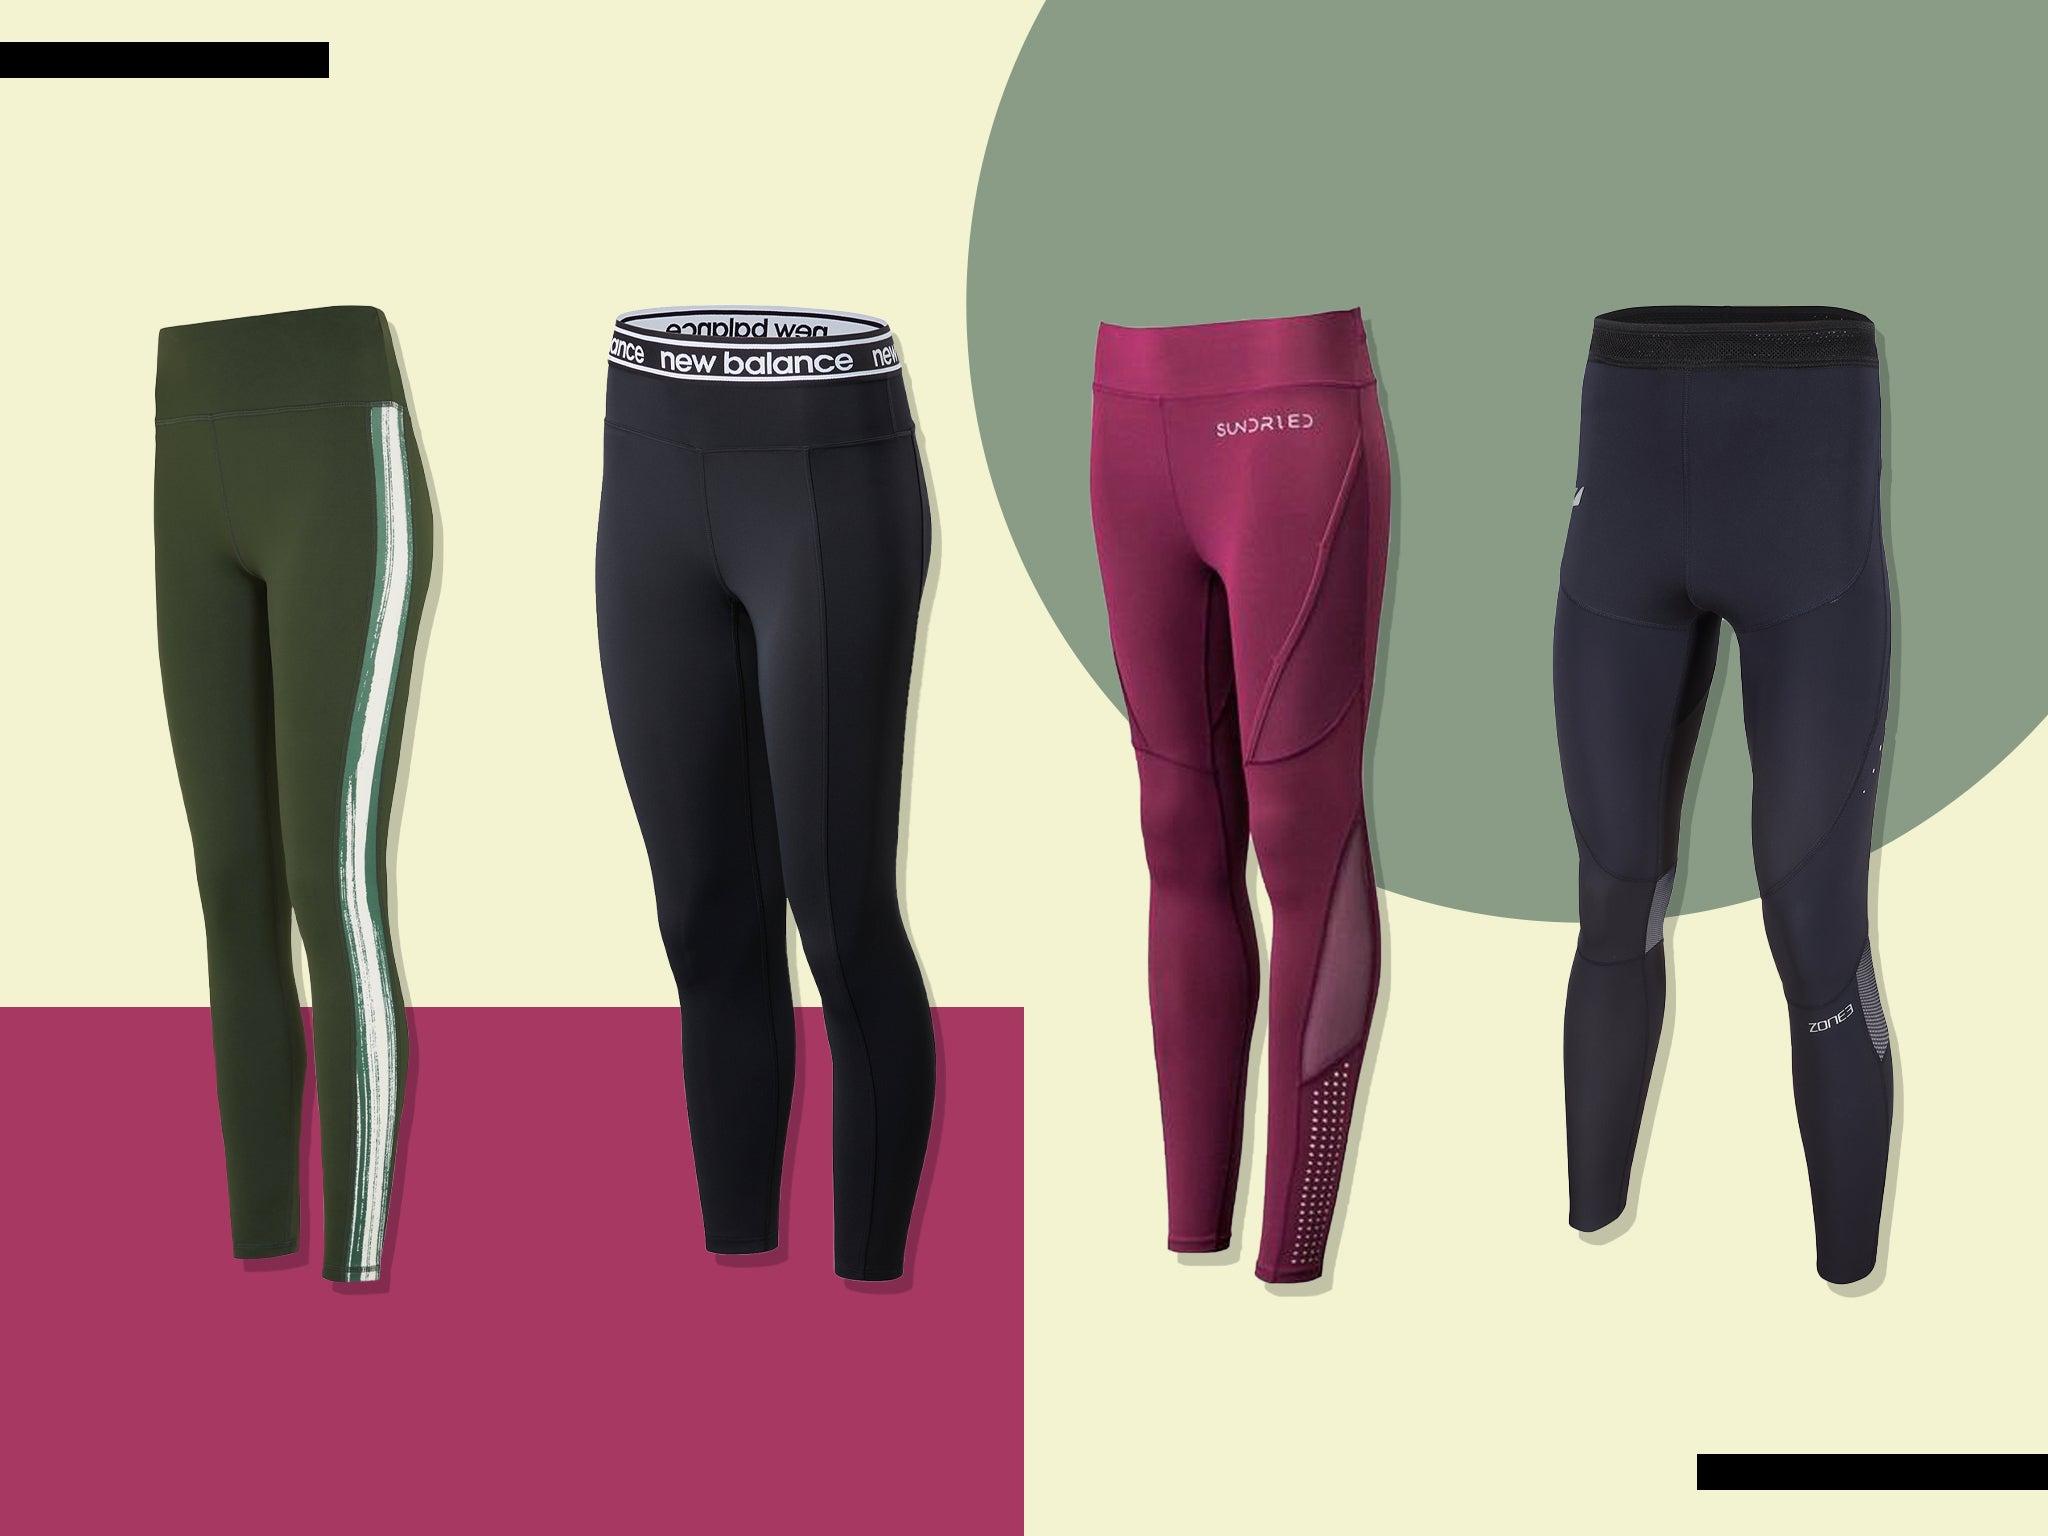 Sundried Womens Sport Gym Leggings Premium Sport Fabric Designer Fitness Running Tights Yoga Gym Training